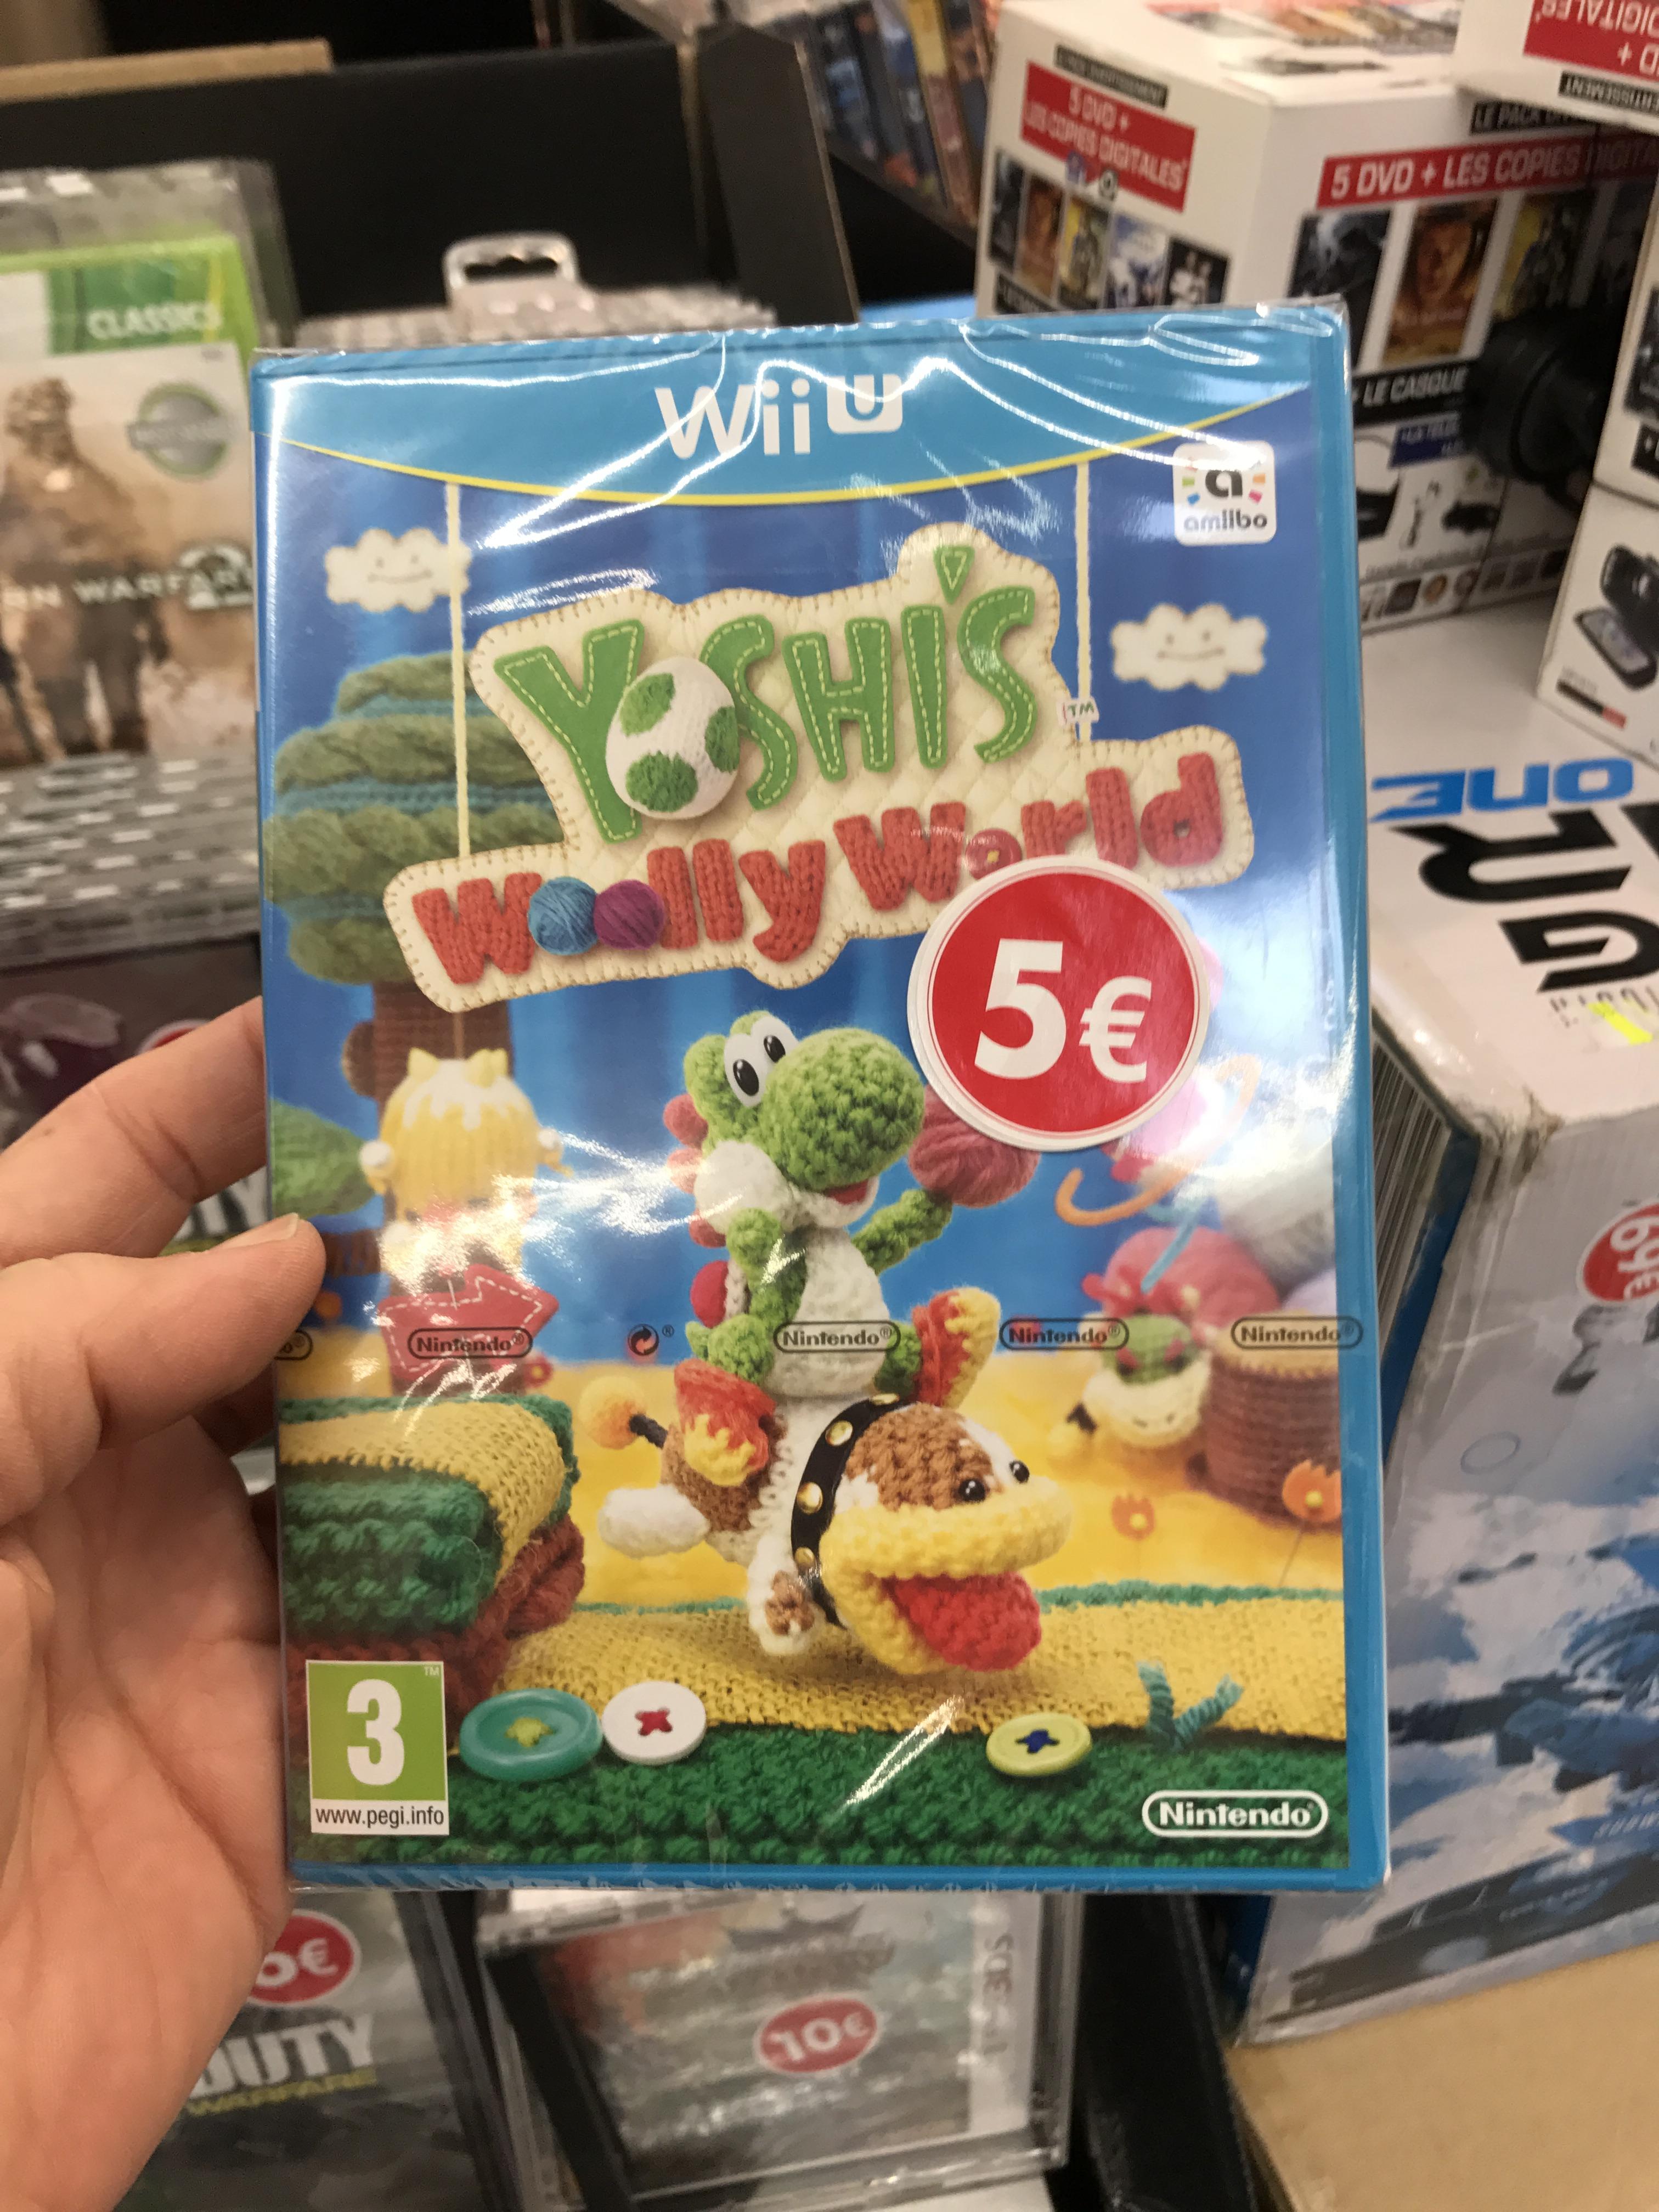 Jeu Yoshi Wooly World sur Wii U - Villeneuve la Garenne (92)